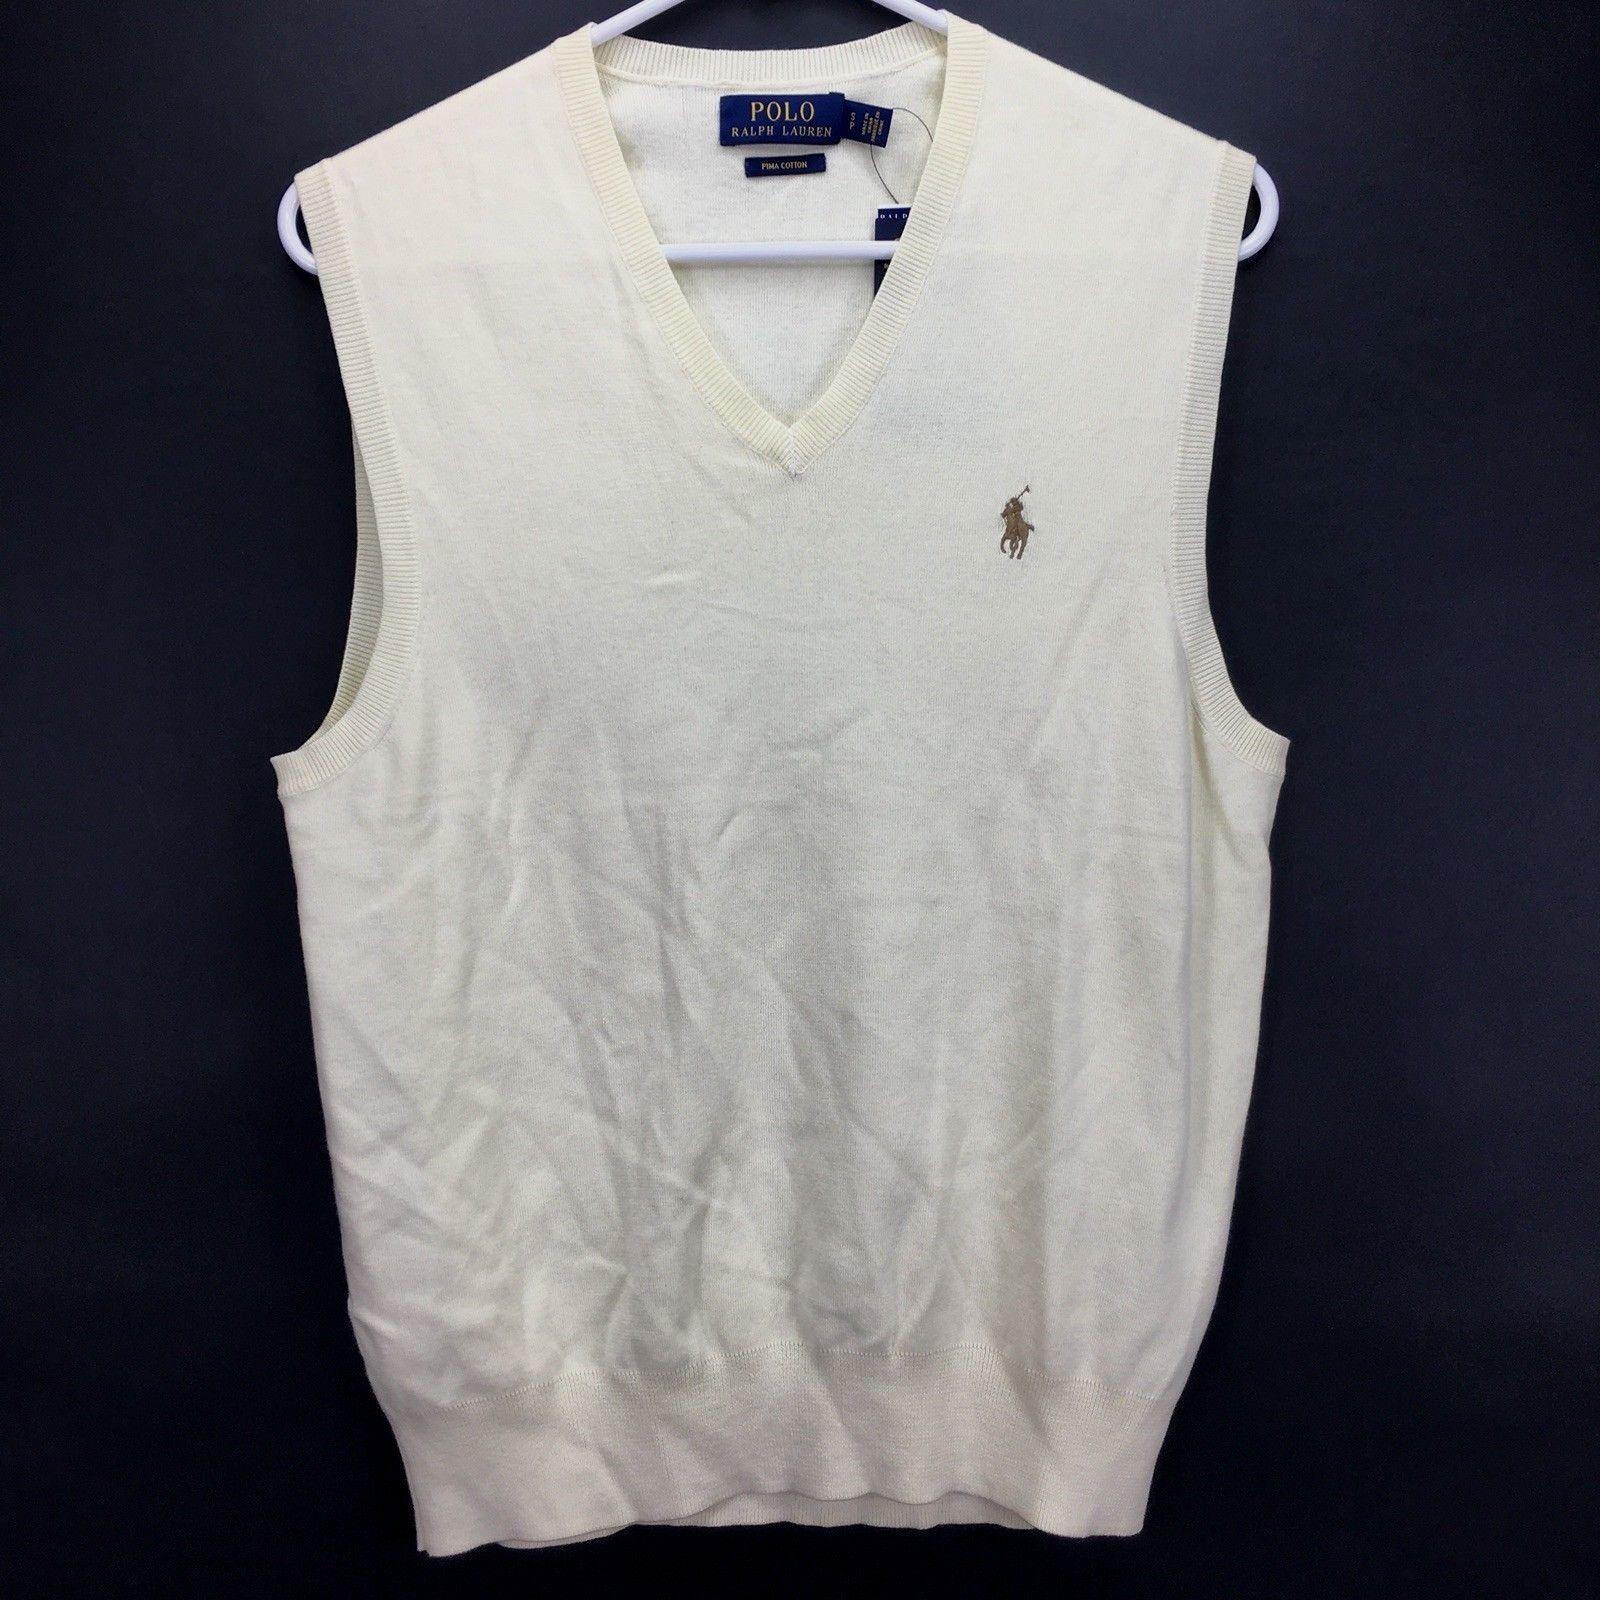 Polo Ralph Lauren Mens Core Solid Pima Cotton Sweater Vest Light Yellow S